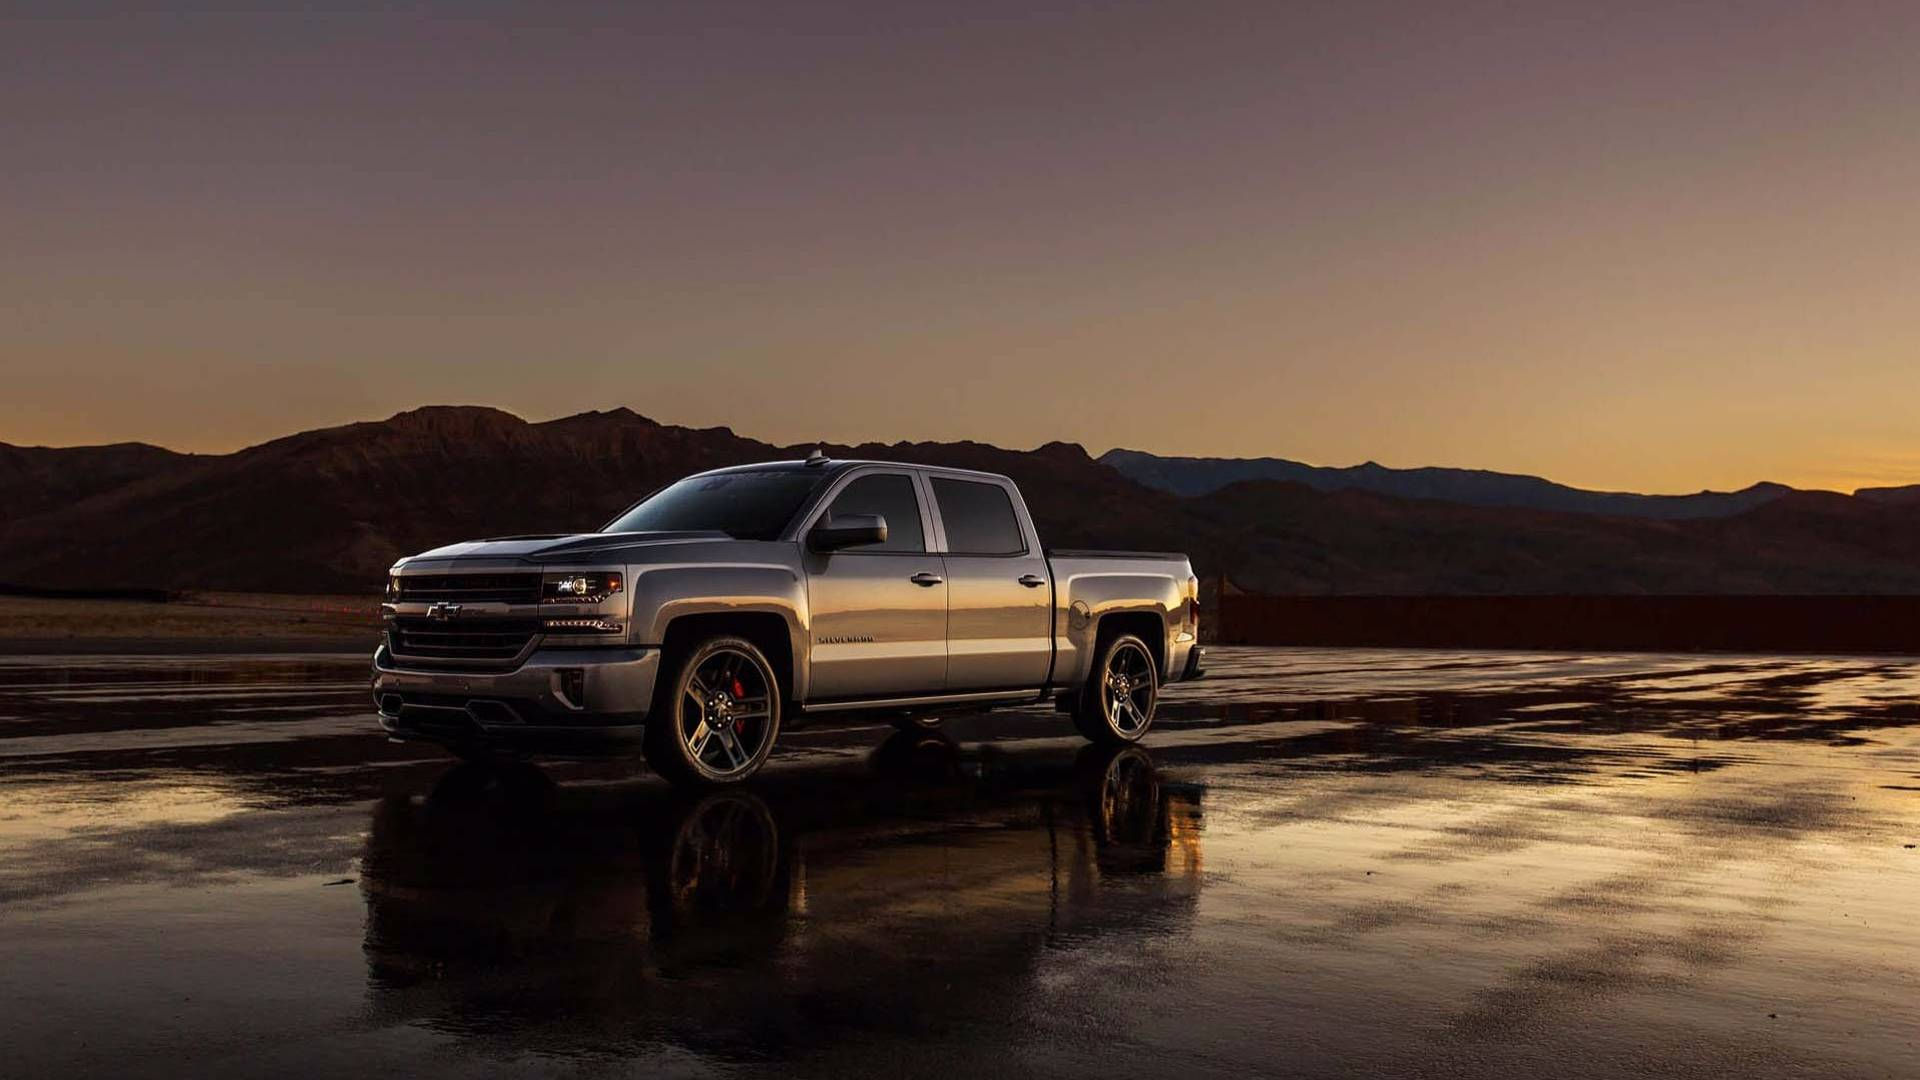 2019 Chevrolet Silverado Concept >> 2018 Chevy Silverado Performance Concept Gets Supercharged V8 At SEMA Show - autoevolution